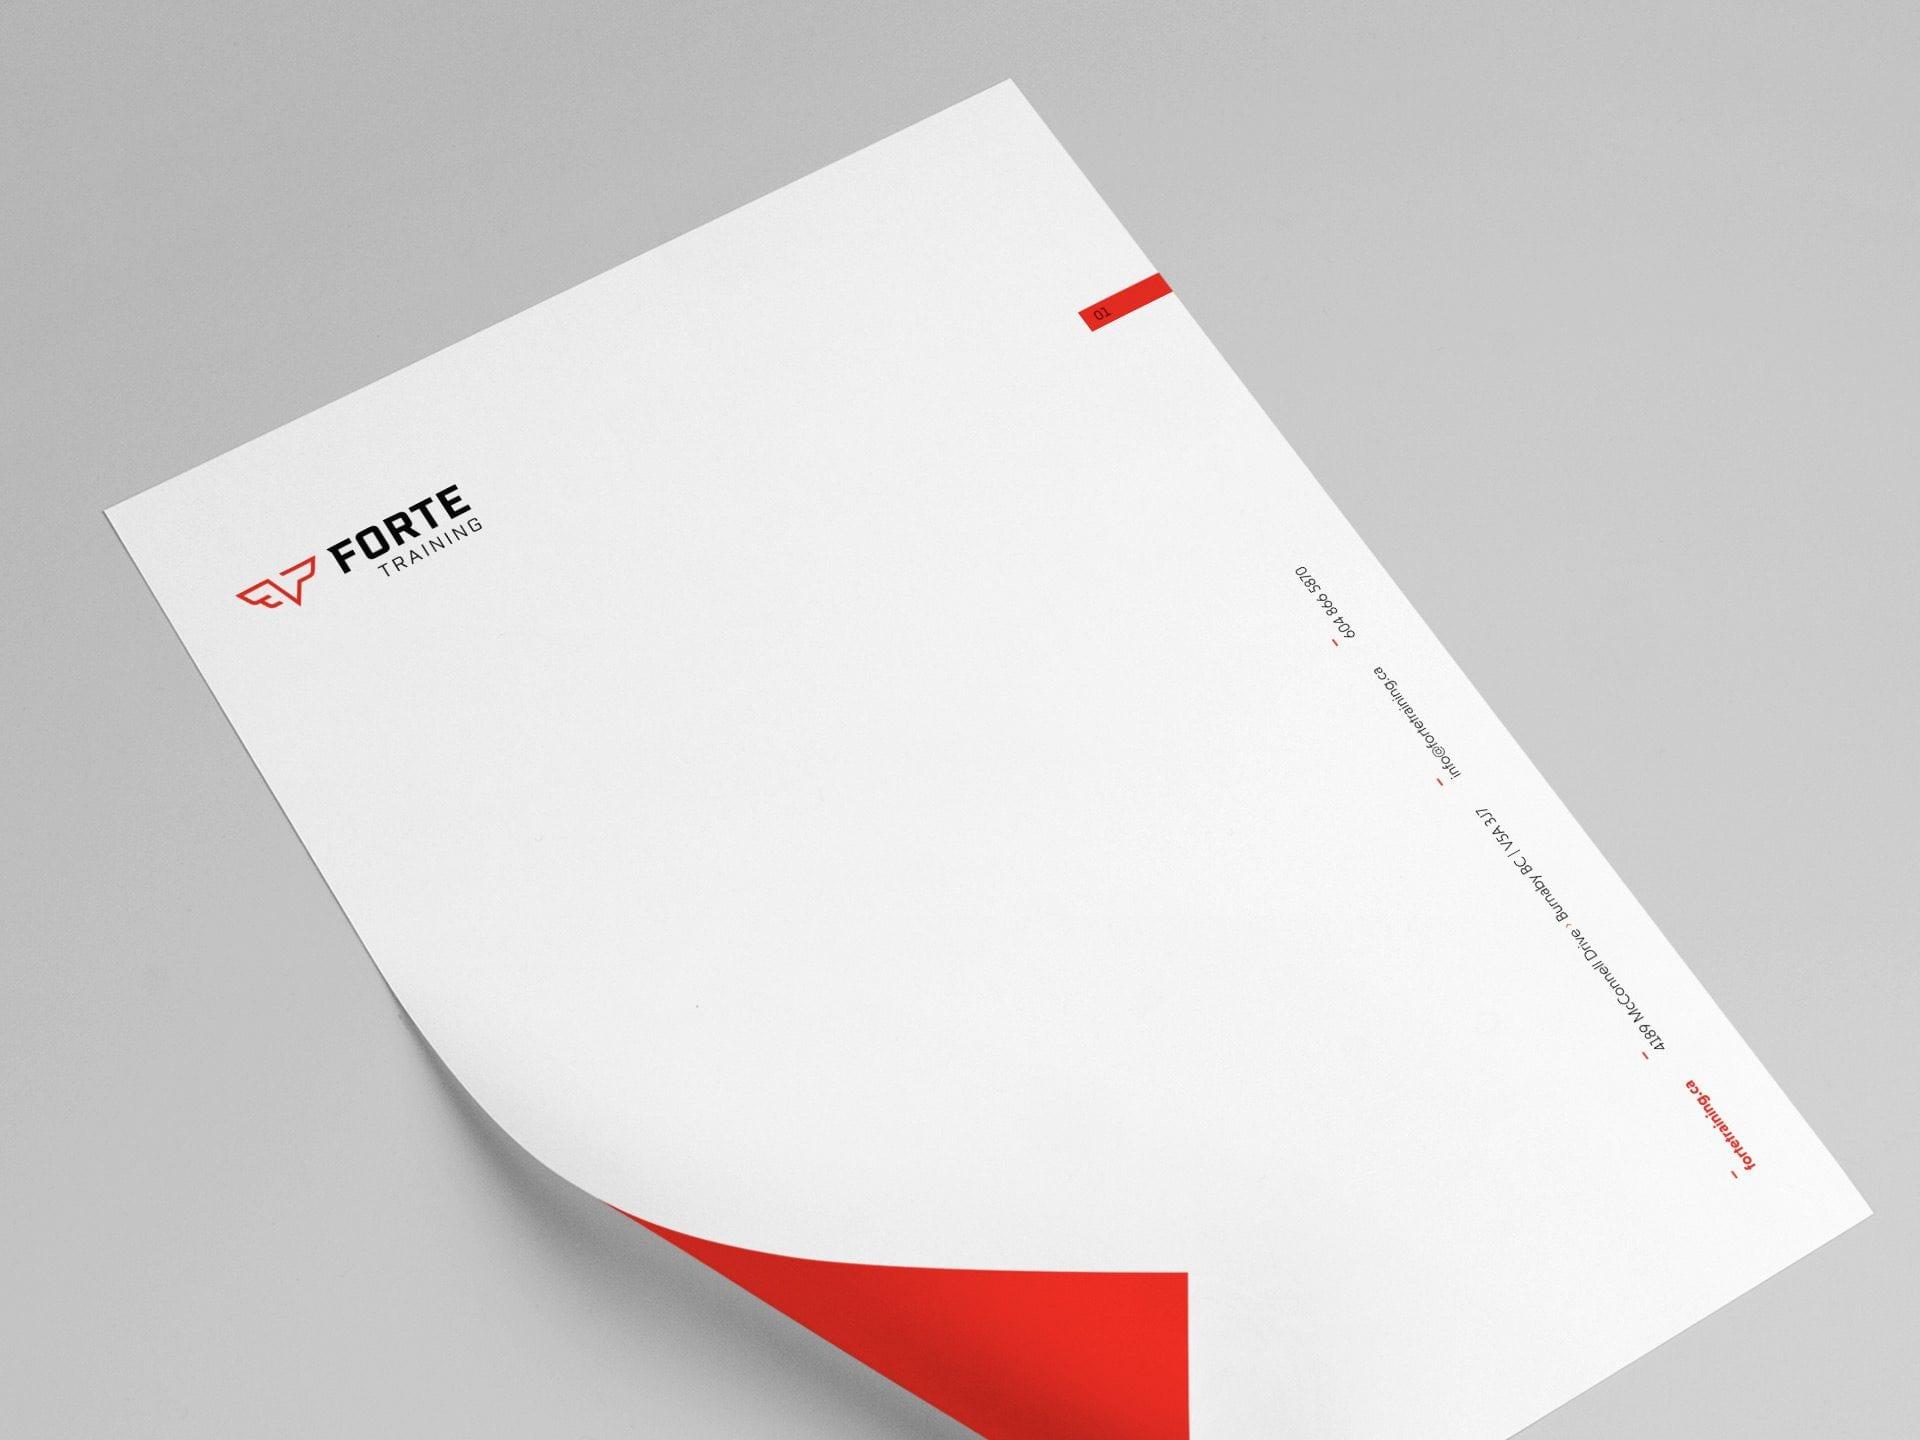 Y5 Creative Case Studies Forte Training 2019 Letterhead